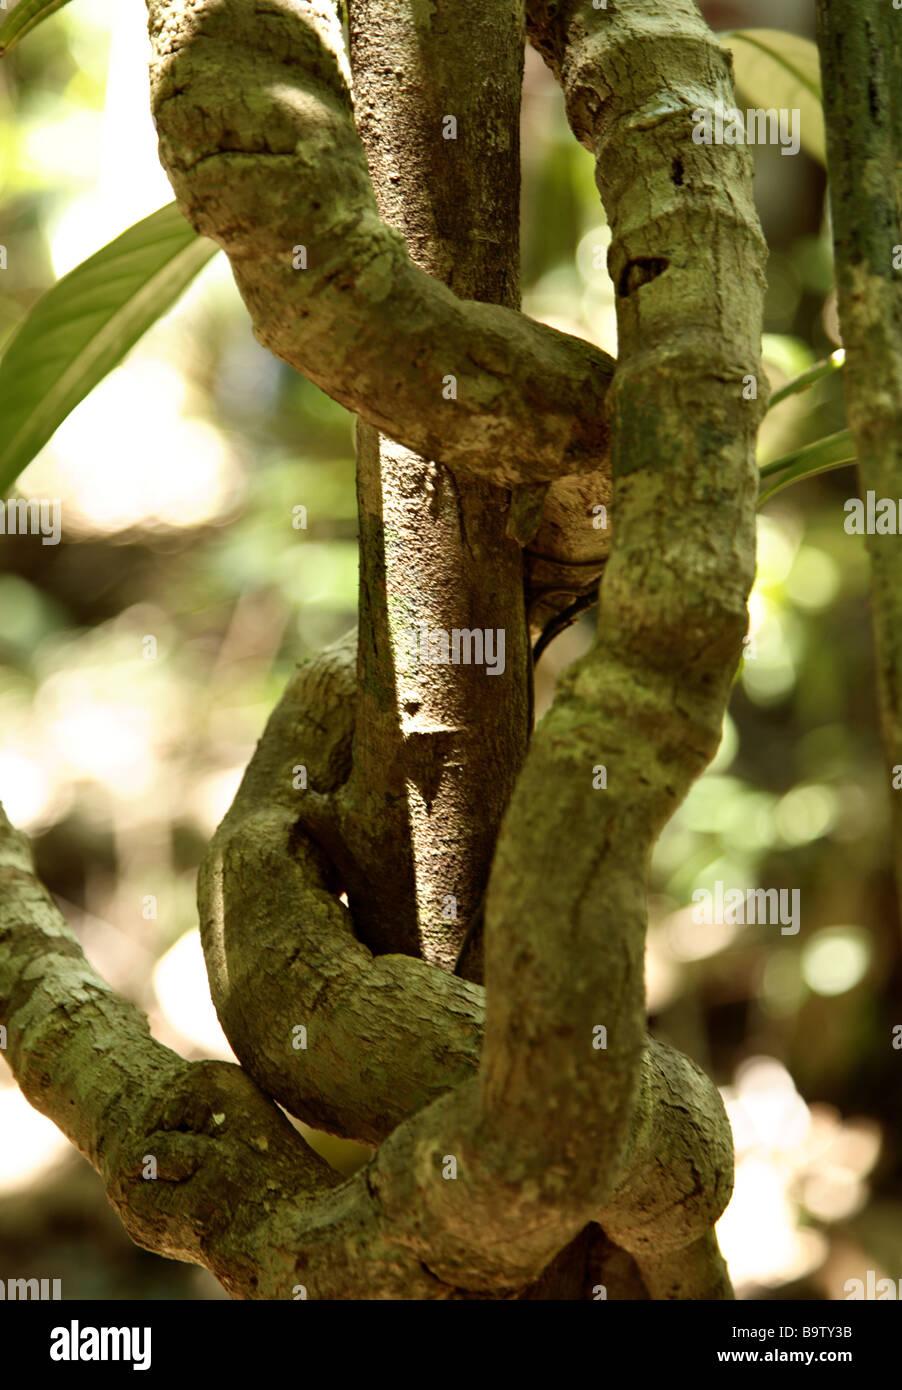 Liana Atlantic Rainforest Ecoparque de Una Bahia Brazil South America - Stock Image